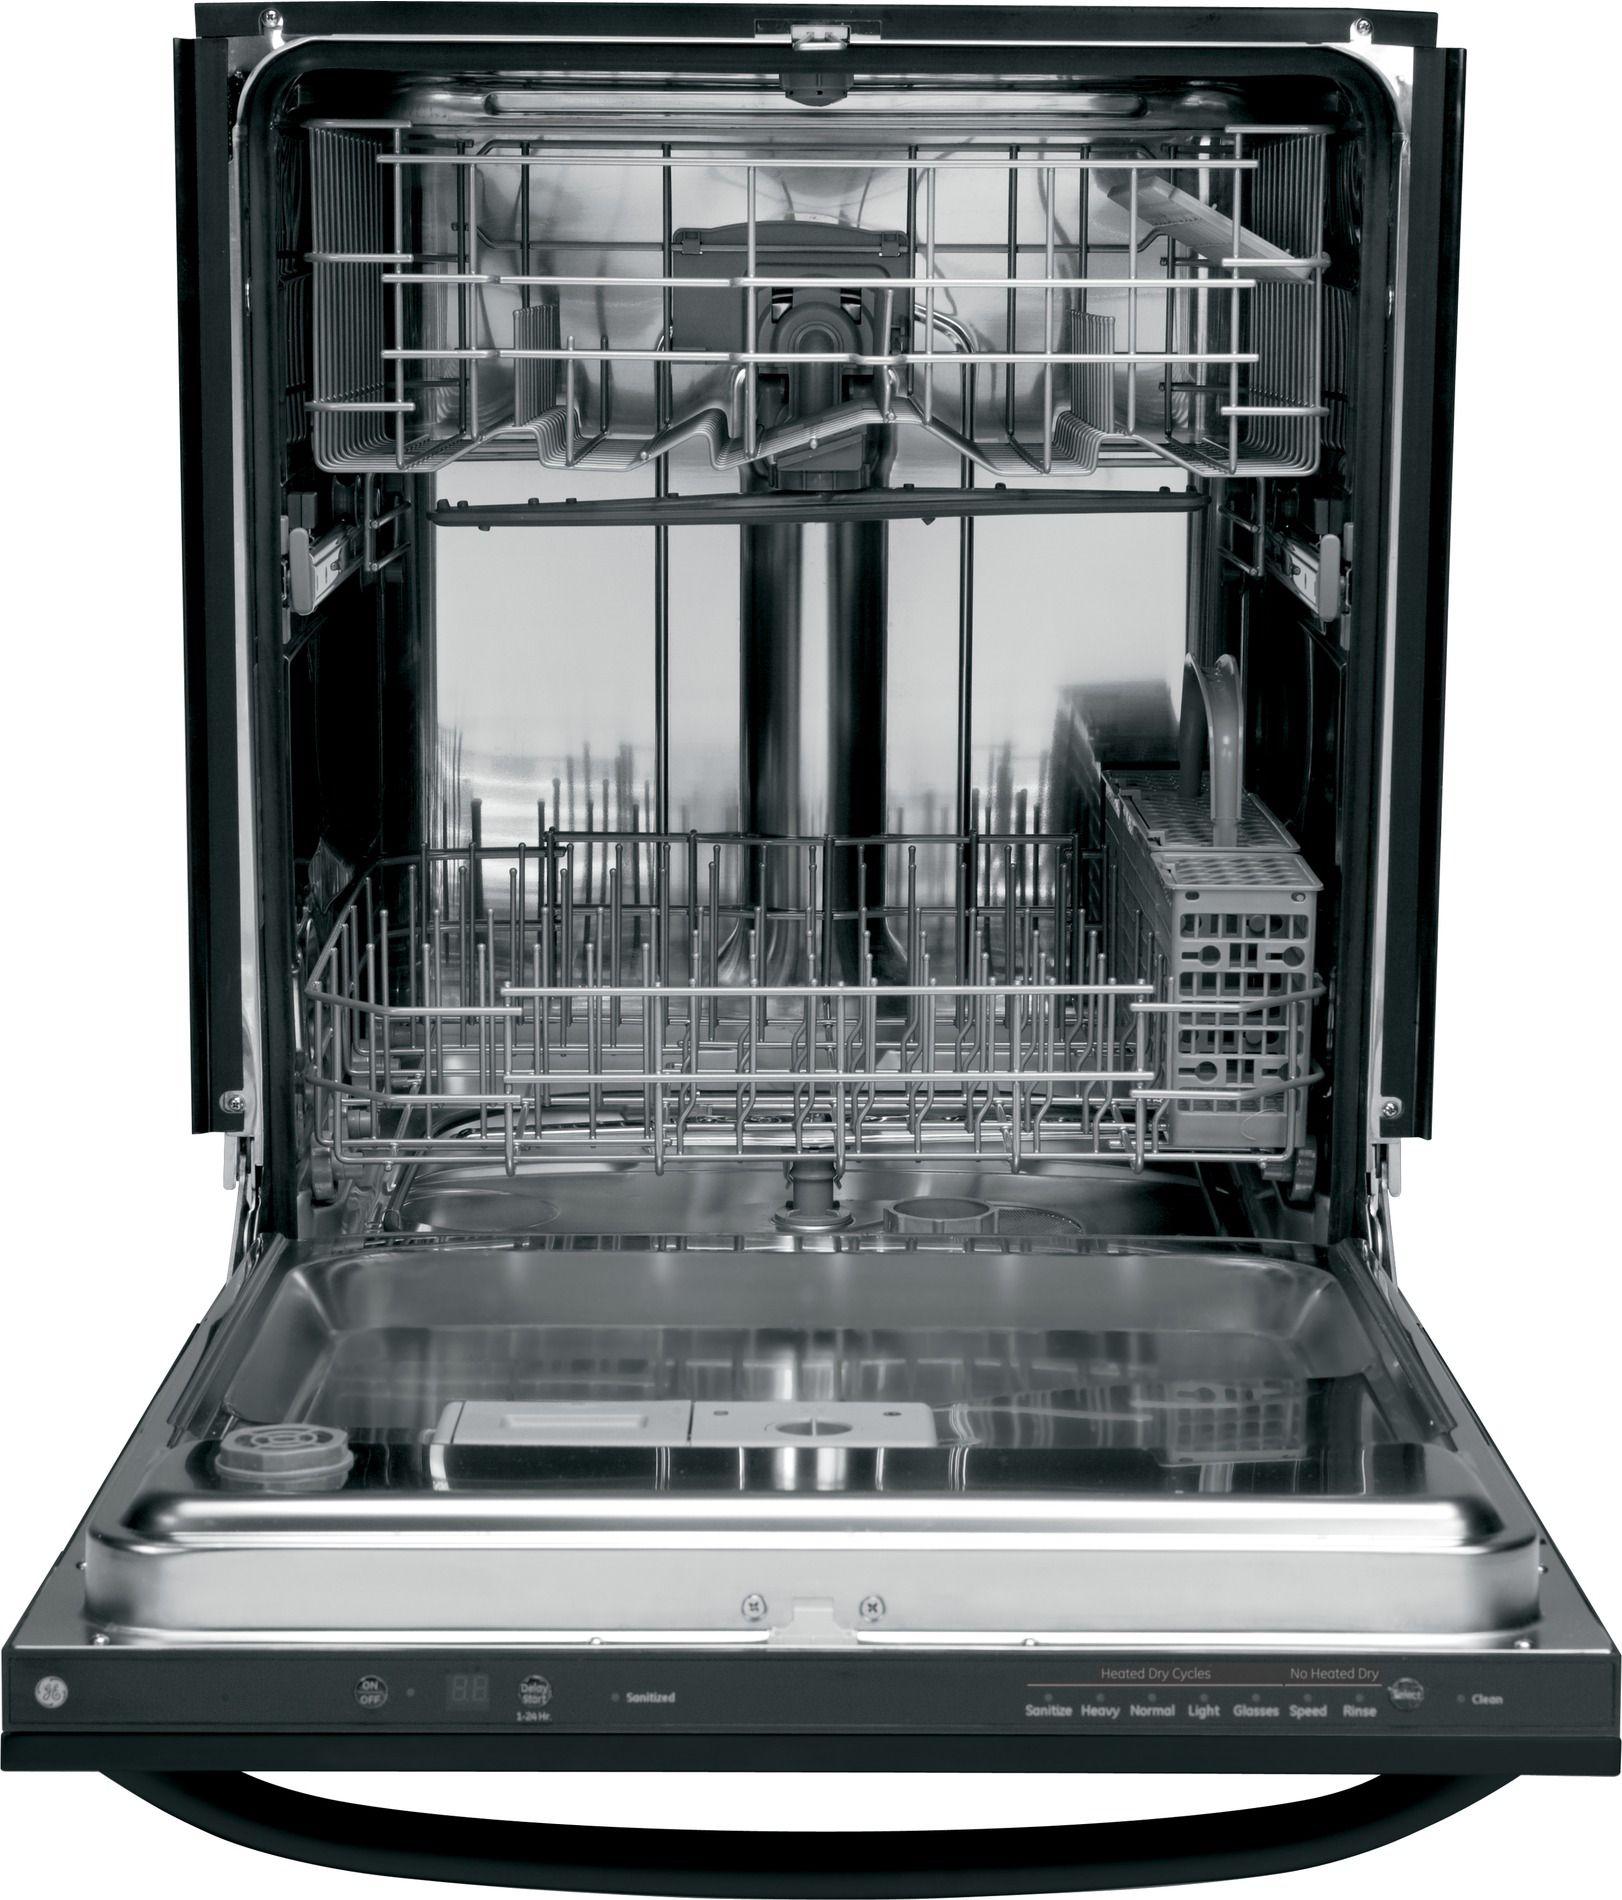 GE 24 in. Built-In Dishwasher (GLD74)